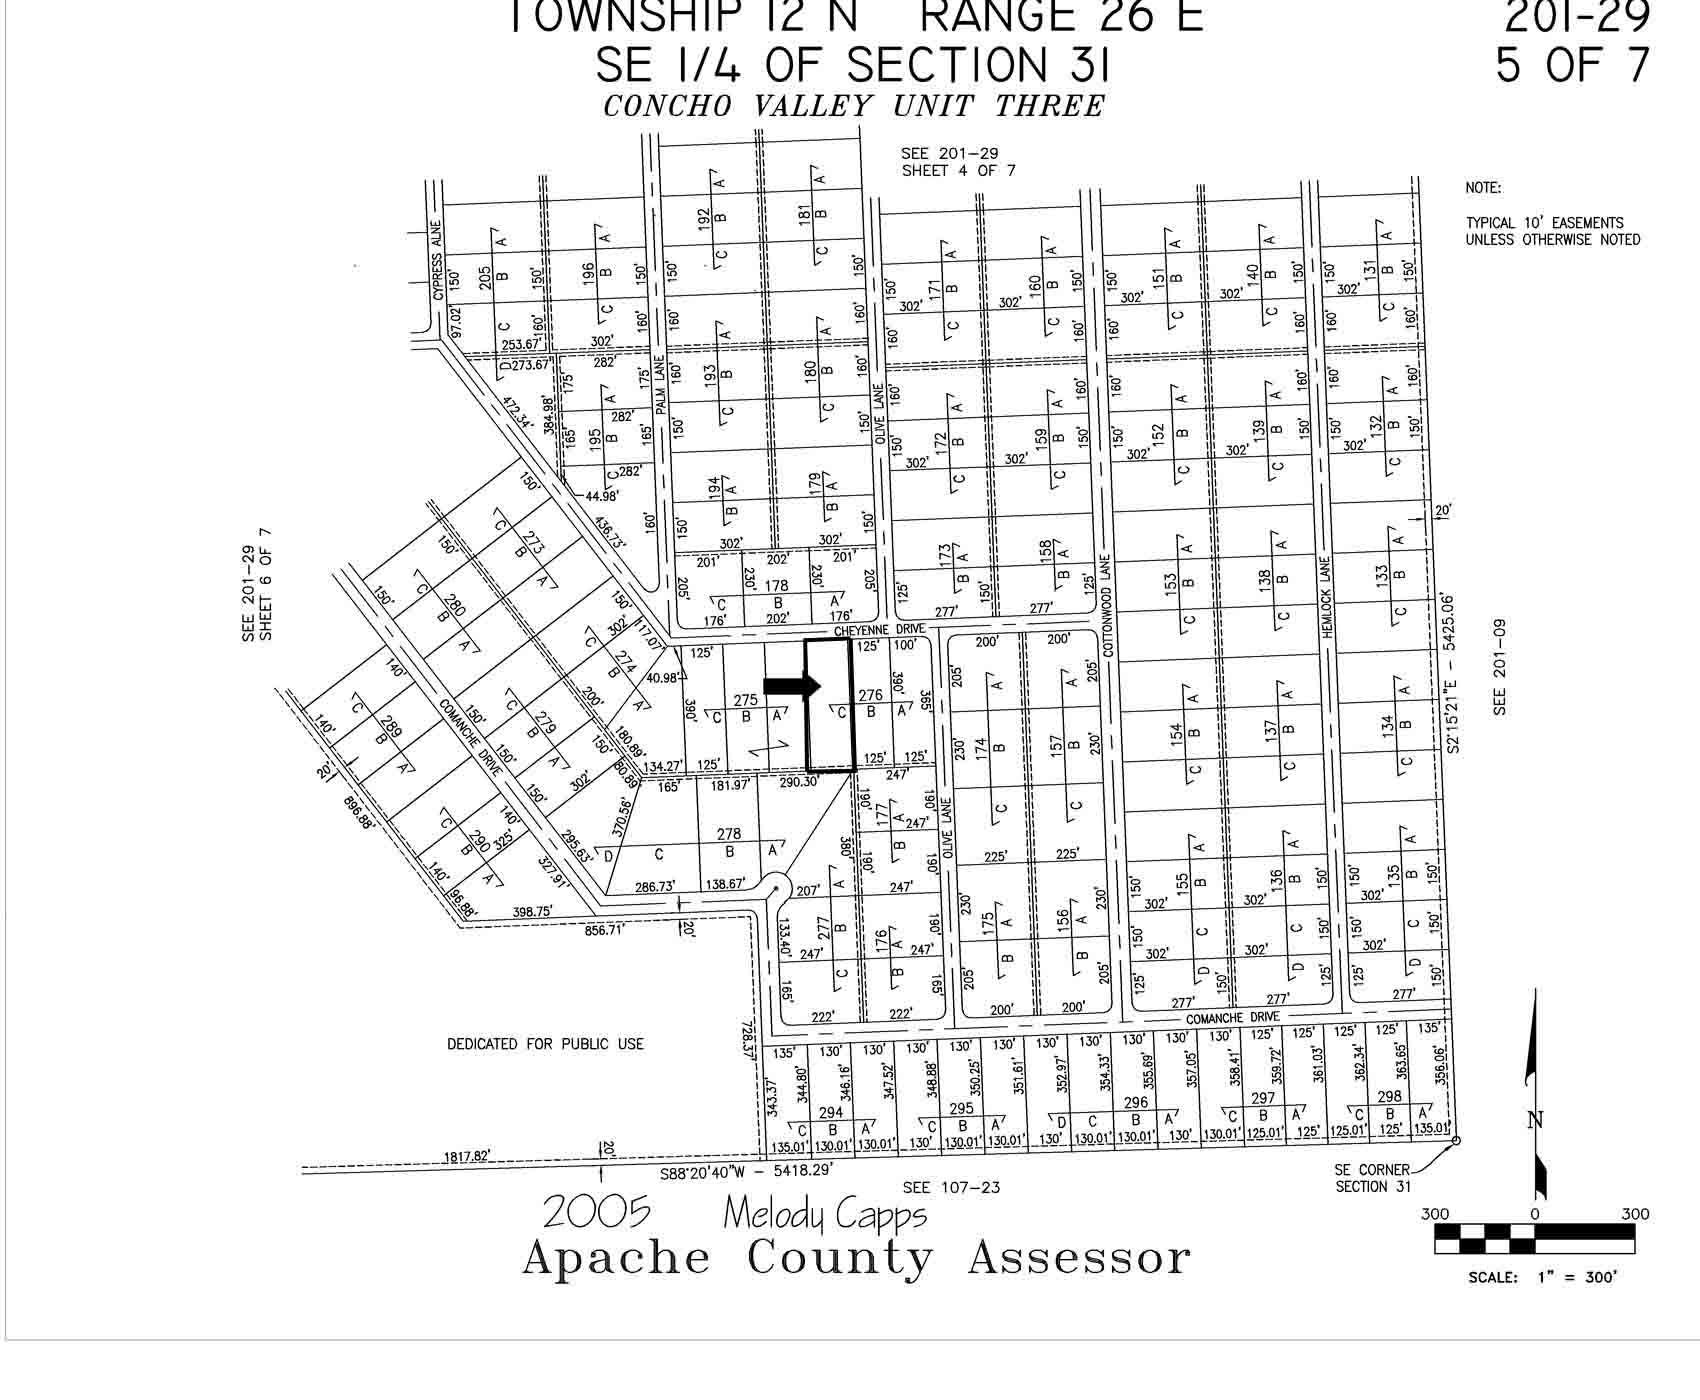 Apache County Arizona Map.Arizona Land Company Land For Sale In Apache County Apn 201 29 276c